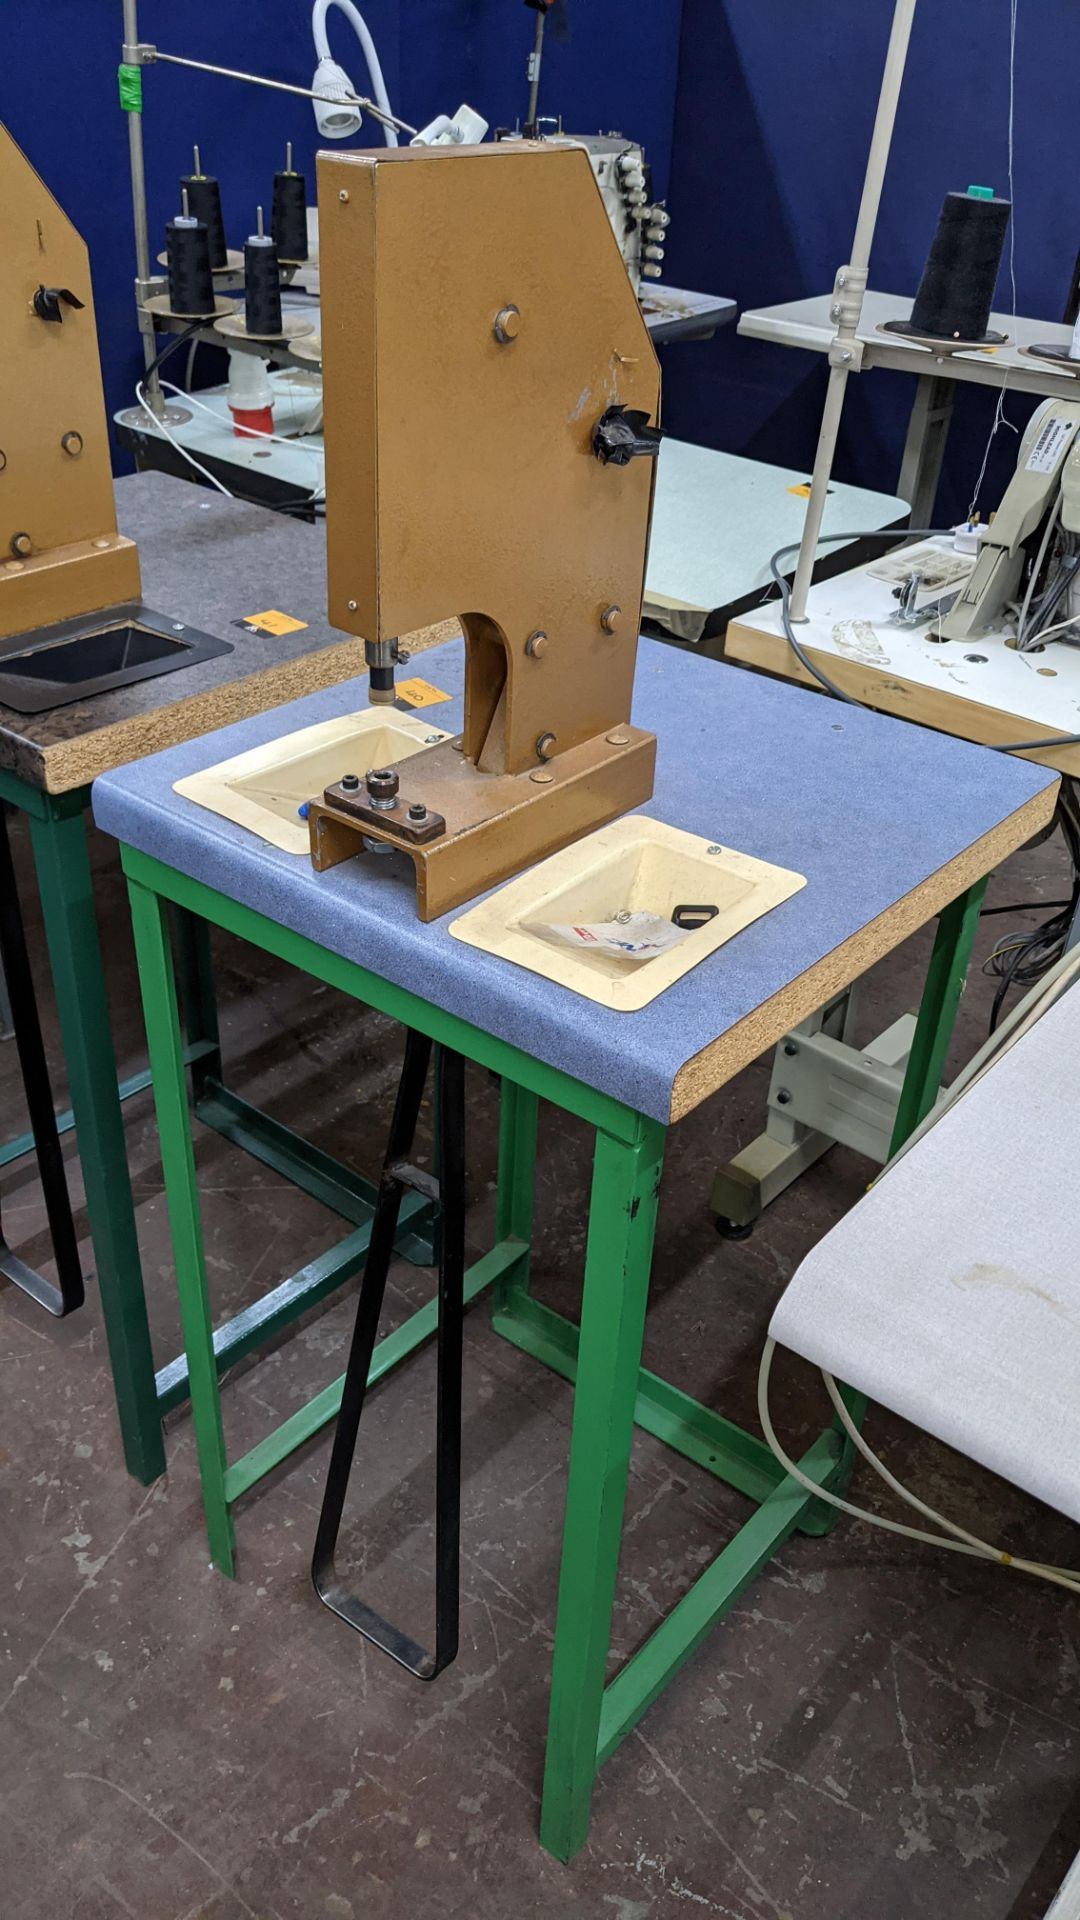 Foot operated riveting machine/press stud machine - Image 2 of 8